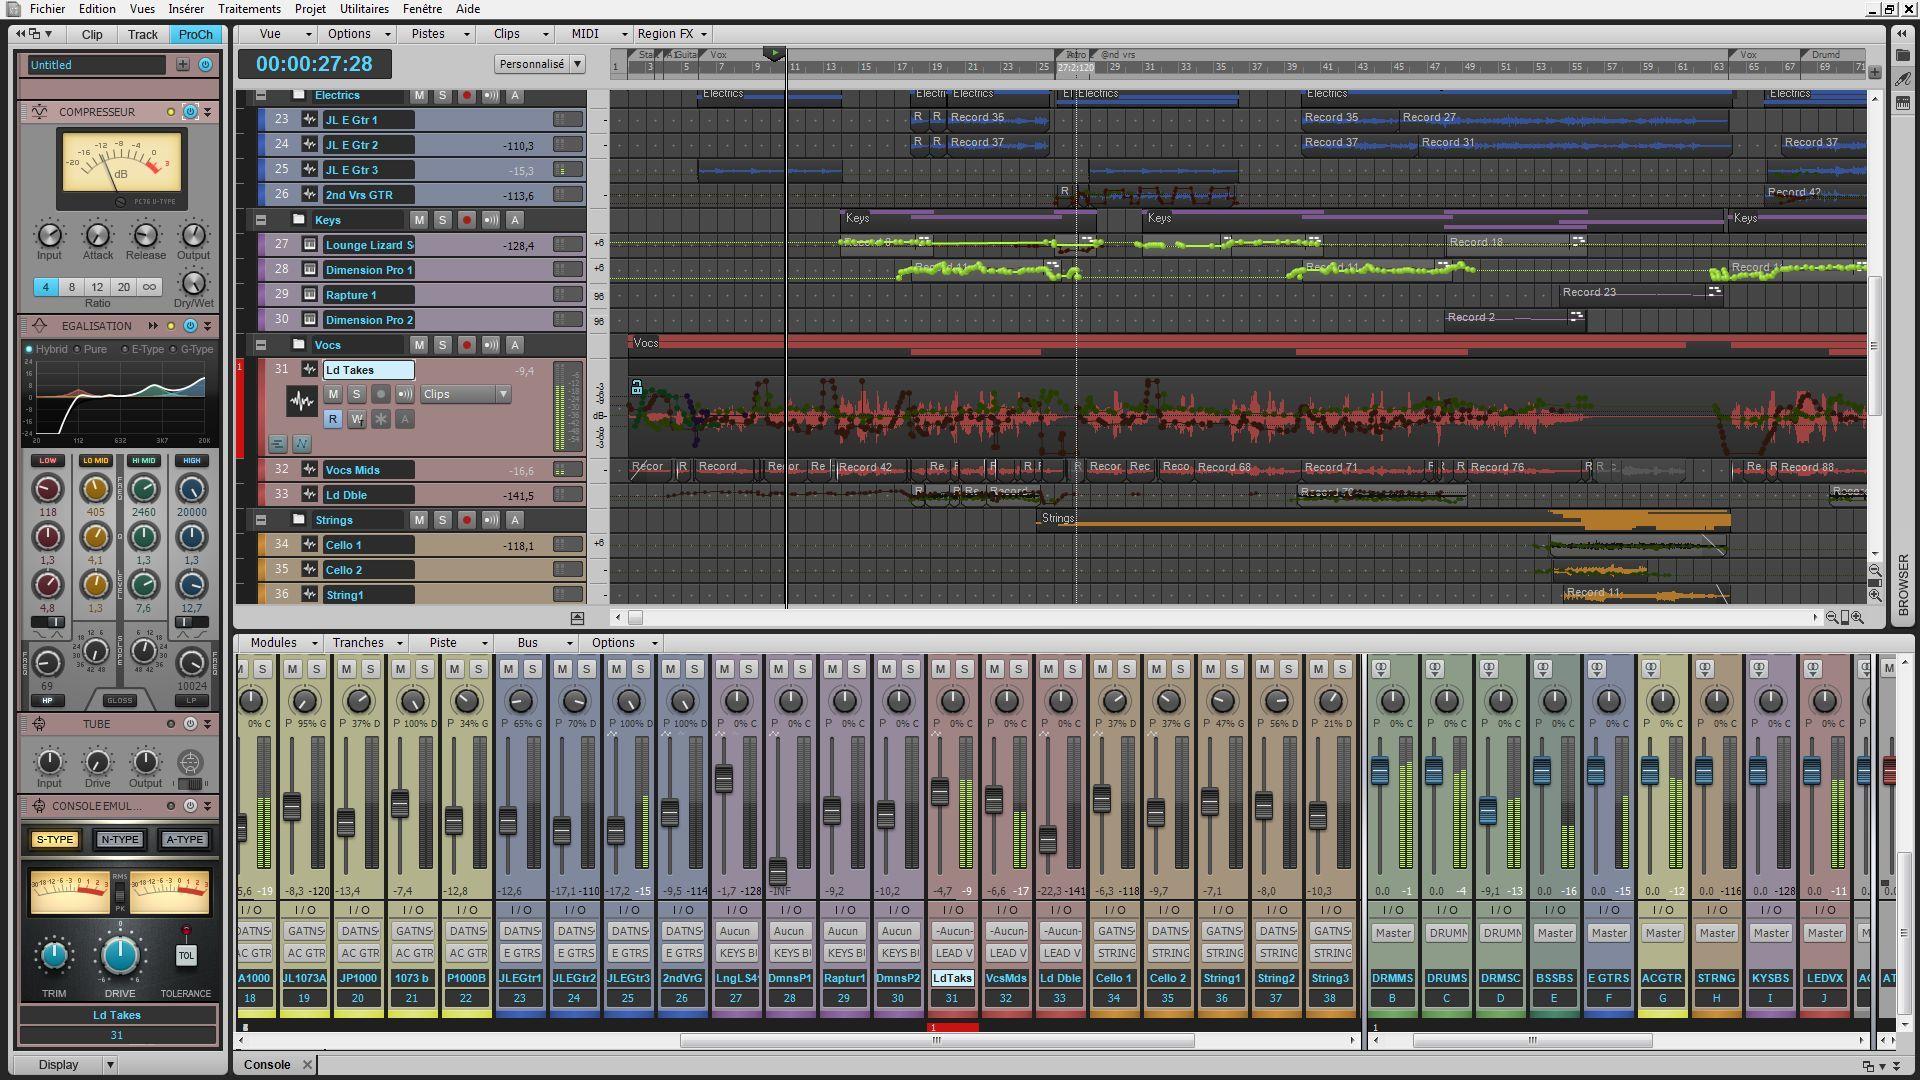 Cakewalk sonar home studio 7 torrent download by rietighbennjing.